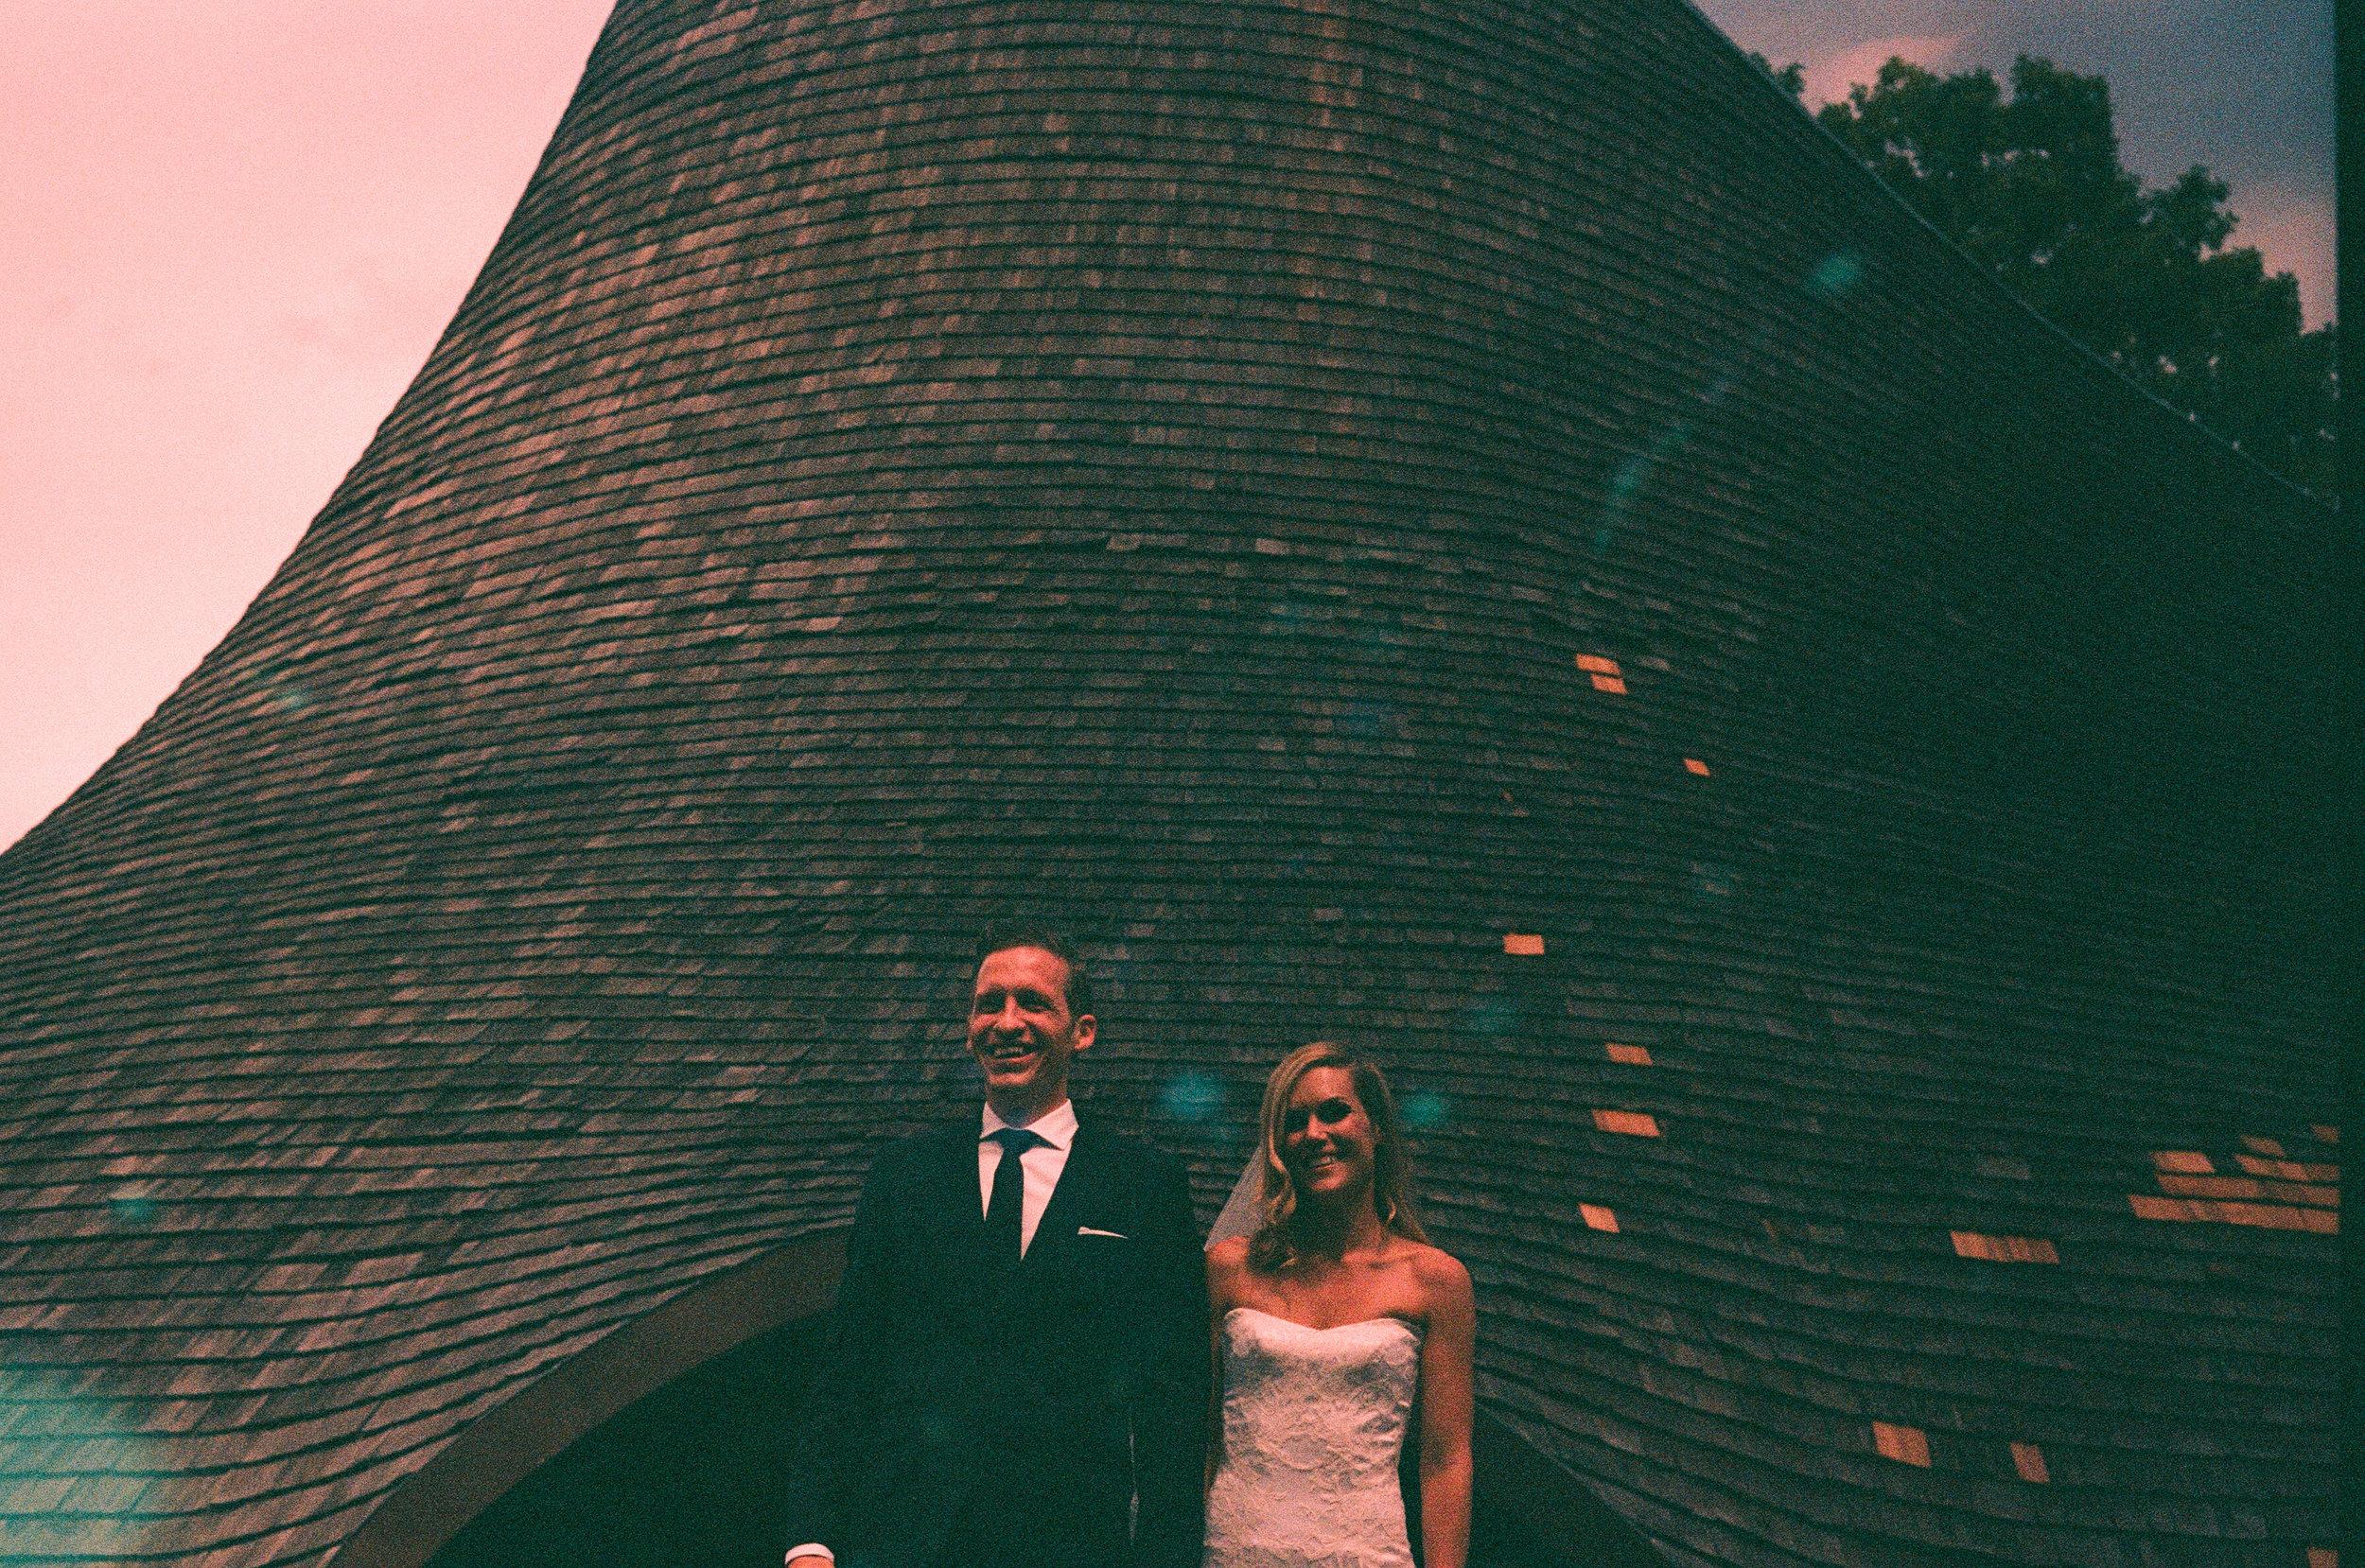 rowayton_library_wedding_35mm-4002.jpg